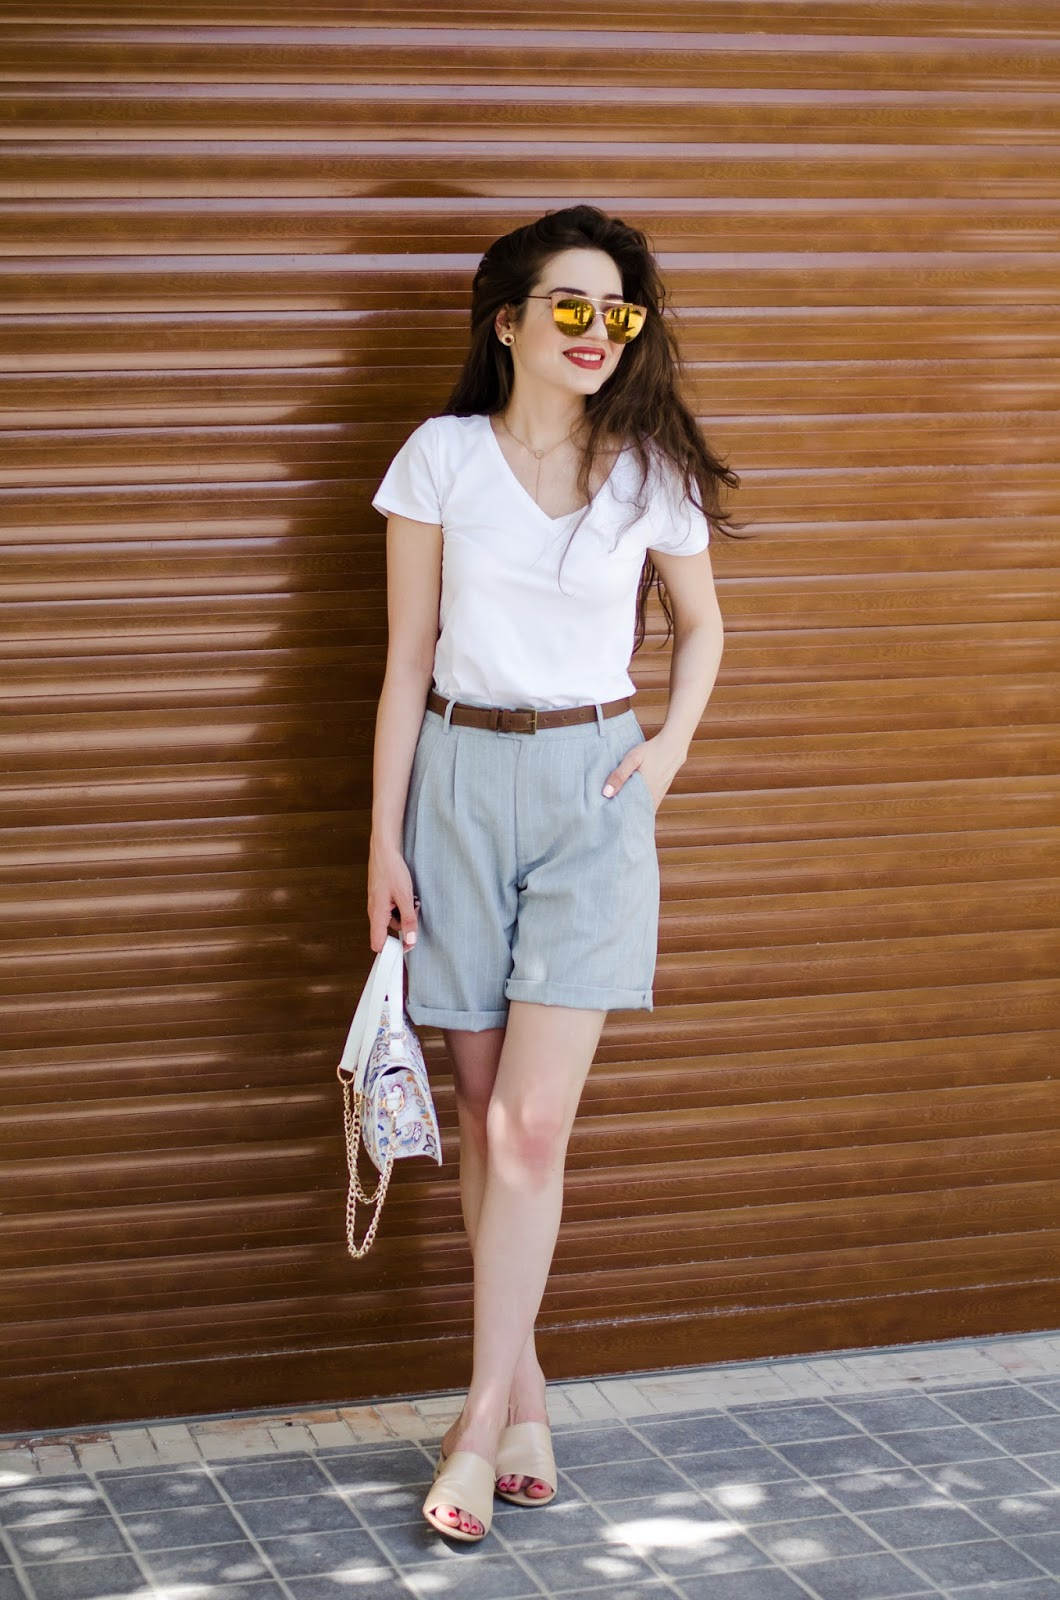 fashion blogger diyorasnotes diyora beta summer outfit 2017 basic lookoftheday shorts white t-shirt how to style short for hot days mules